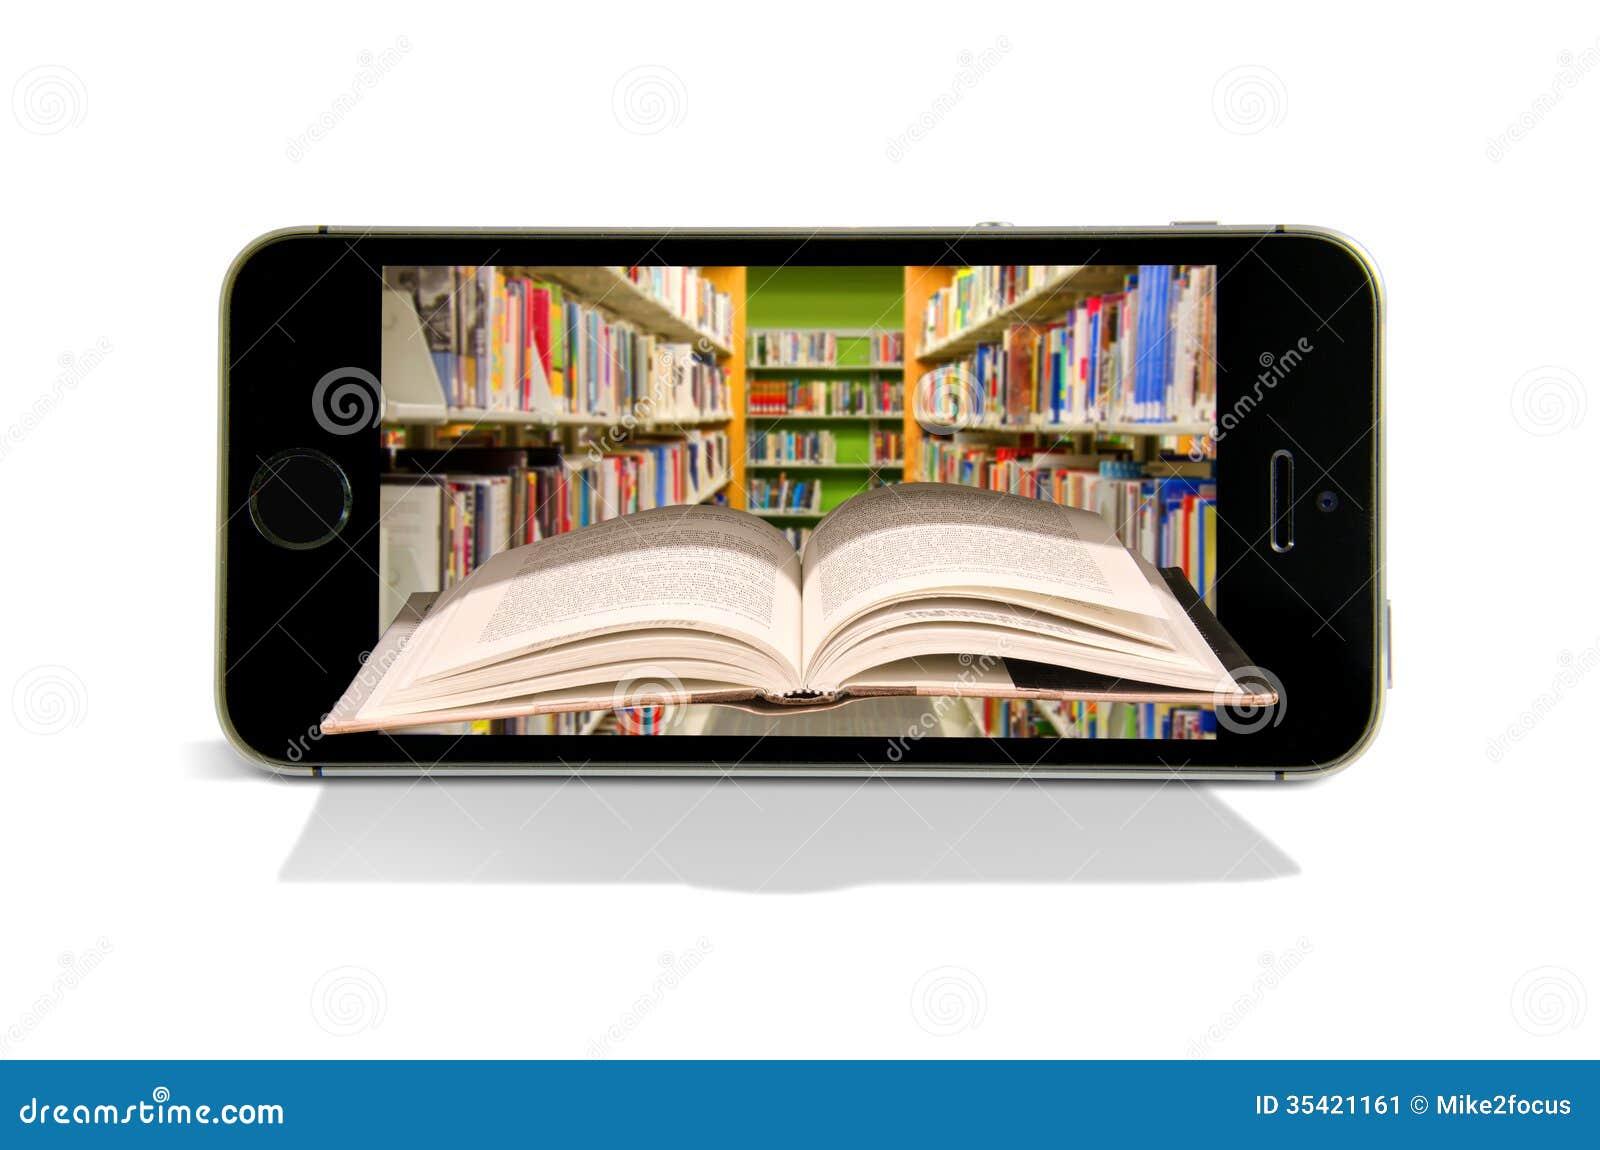 university of reading online application